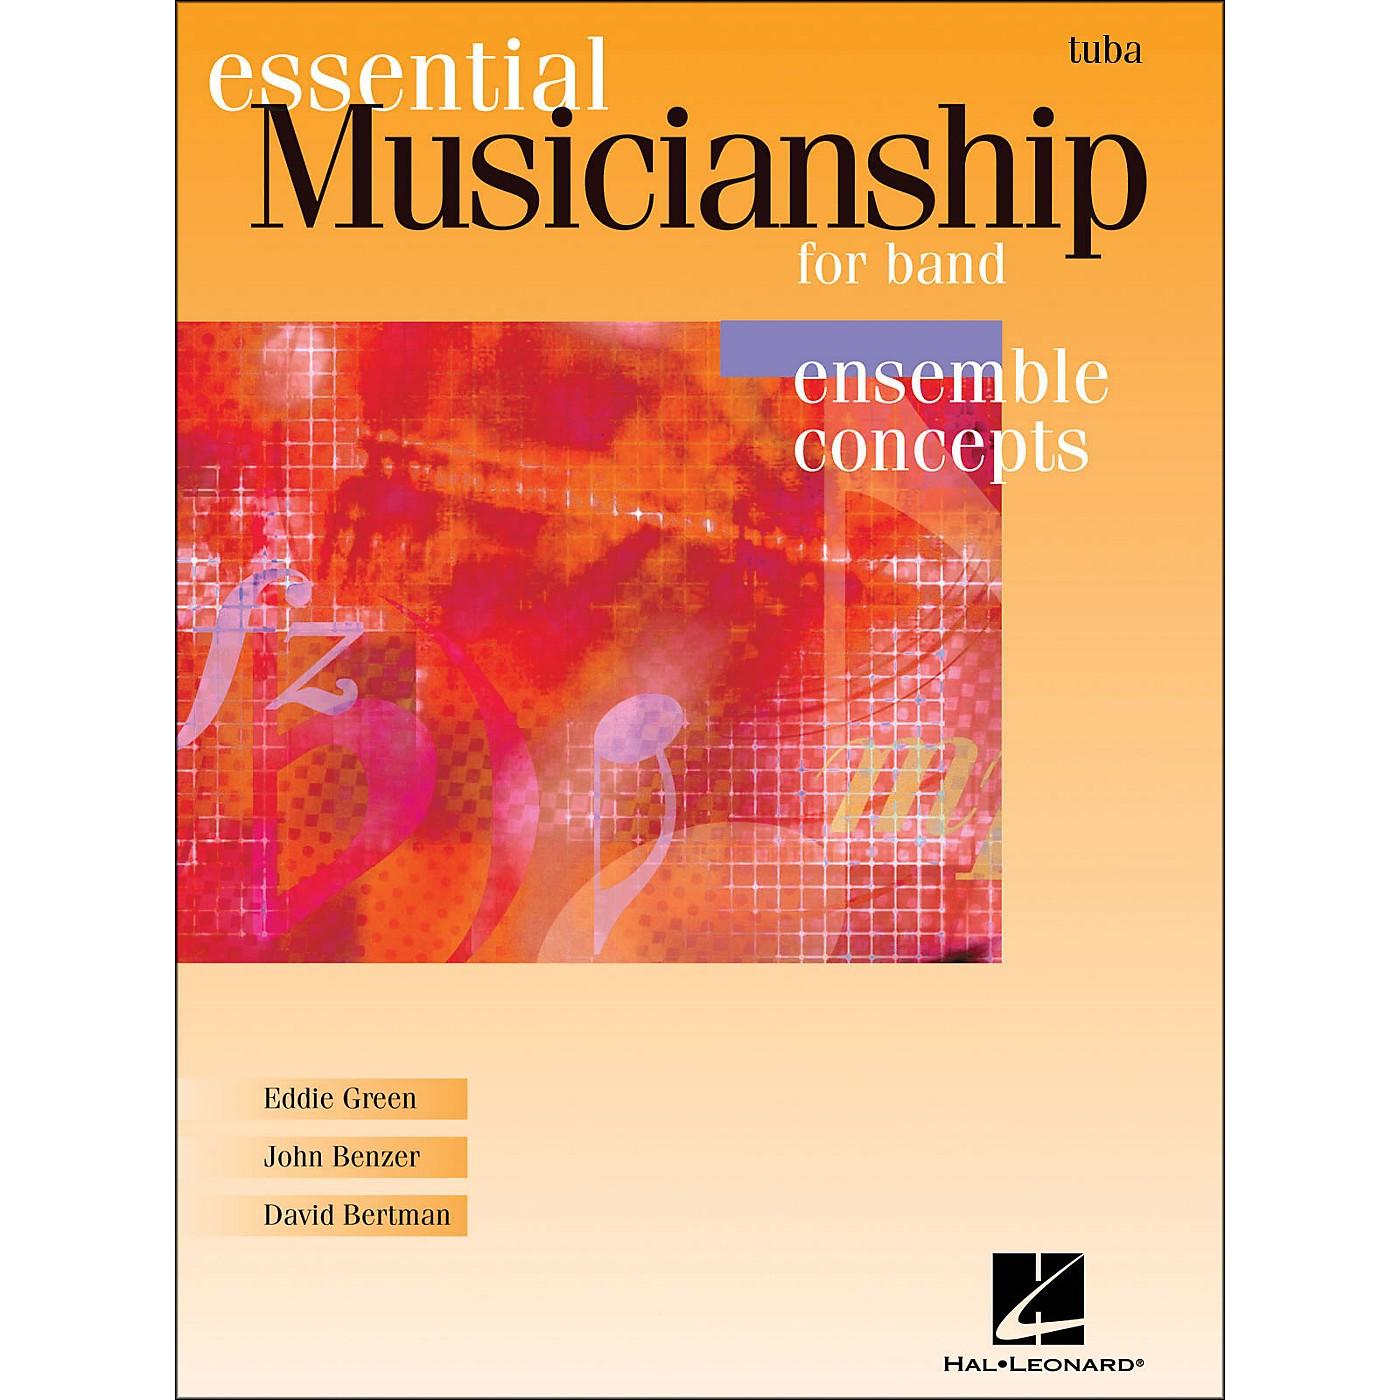 Hal Leonard Essential Musicianship for Band - Ensemble Concepts Tuba thumbnail